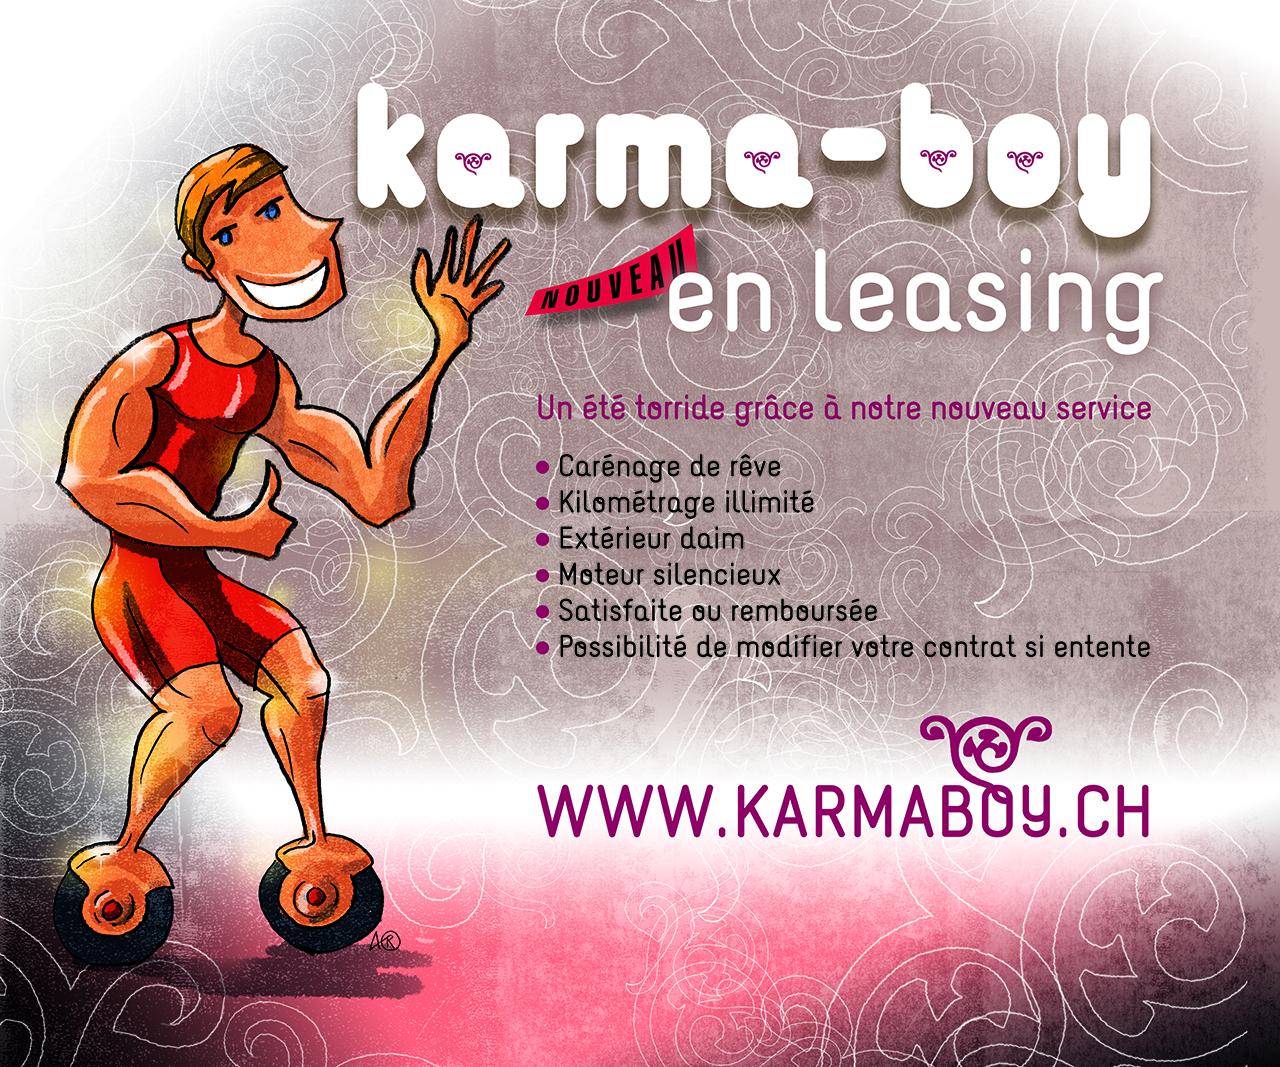 Fausse pub Karma Boy